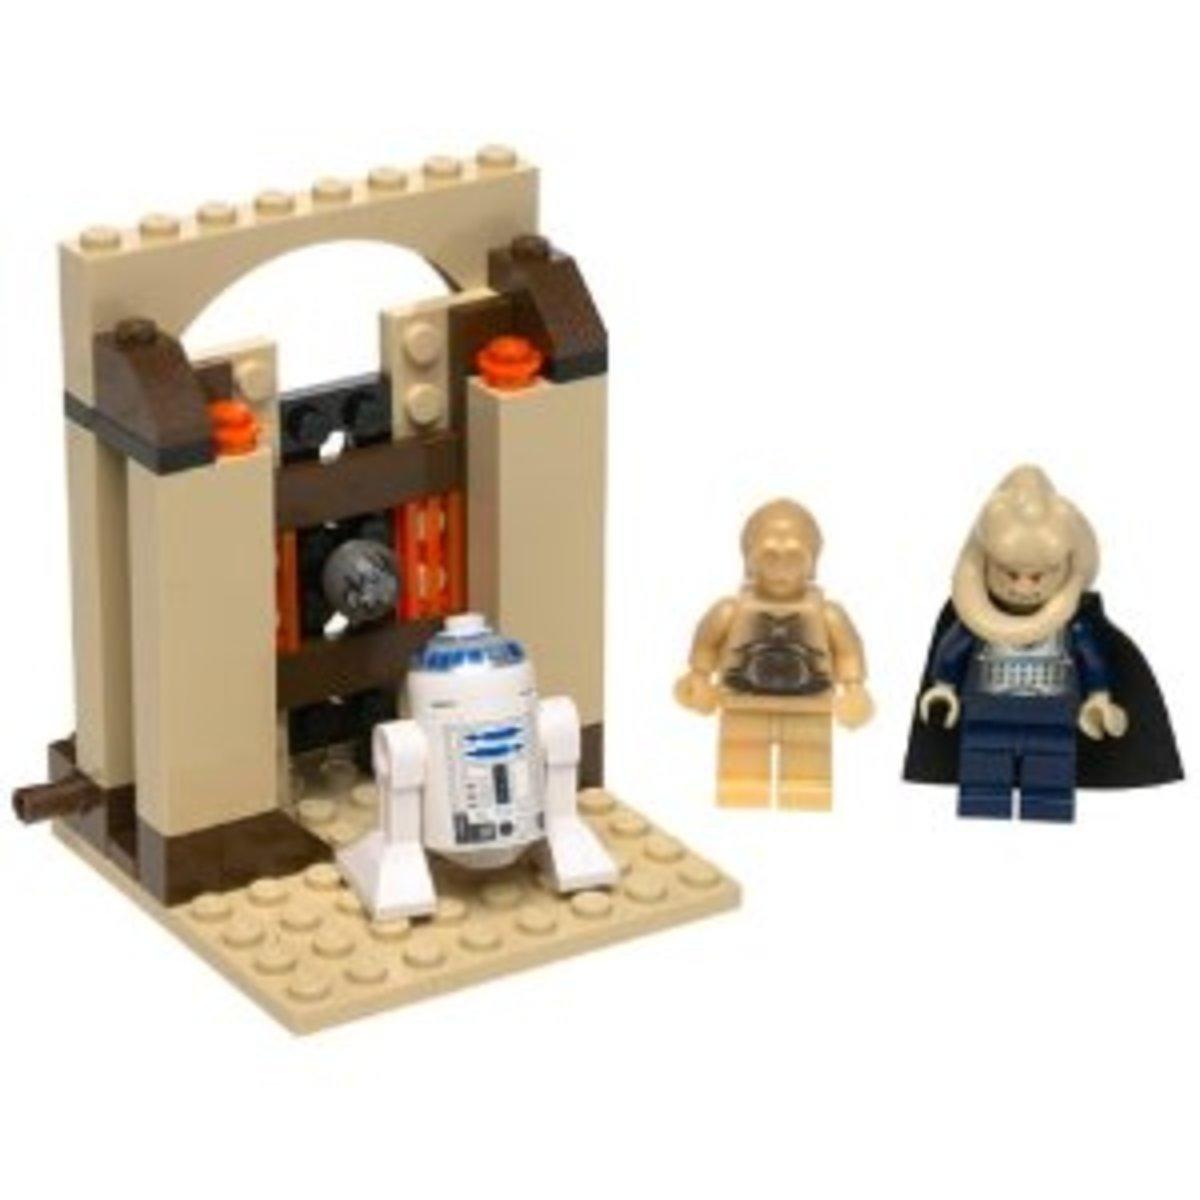 LEGO Star Wars Jabba's Message 4475 Assembled